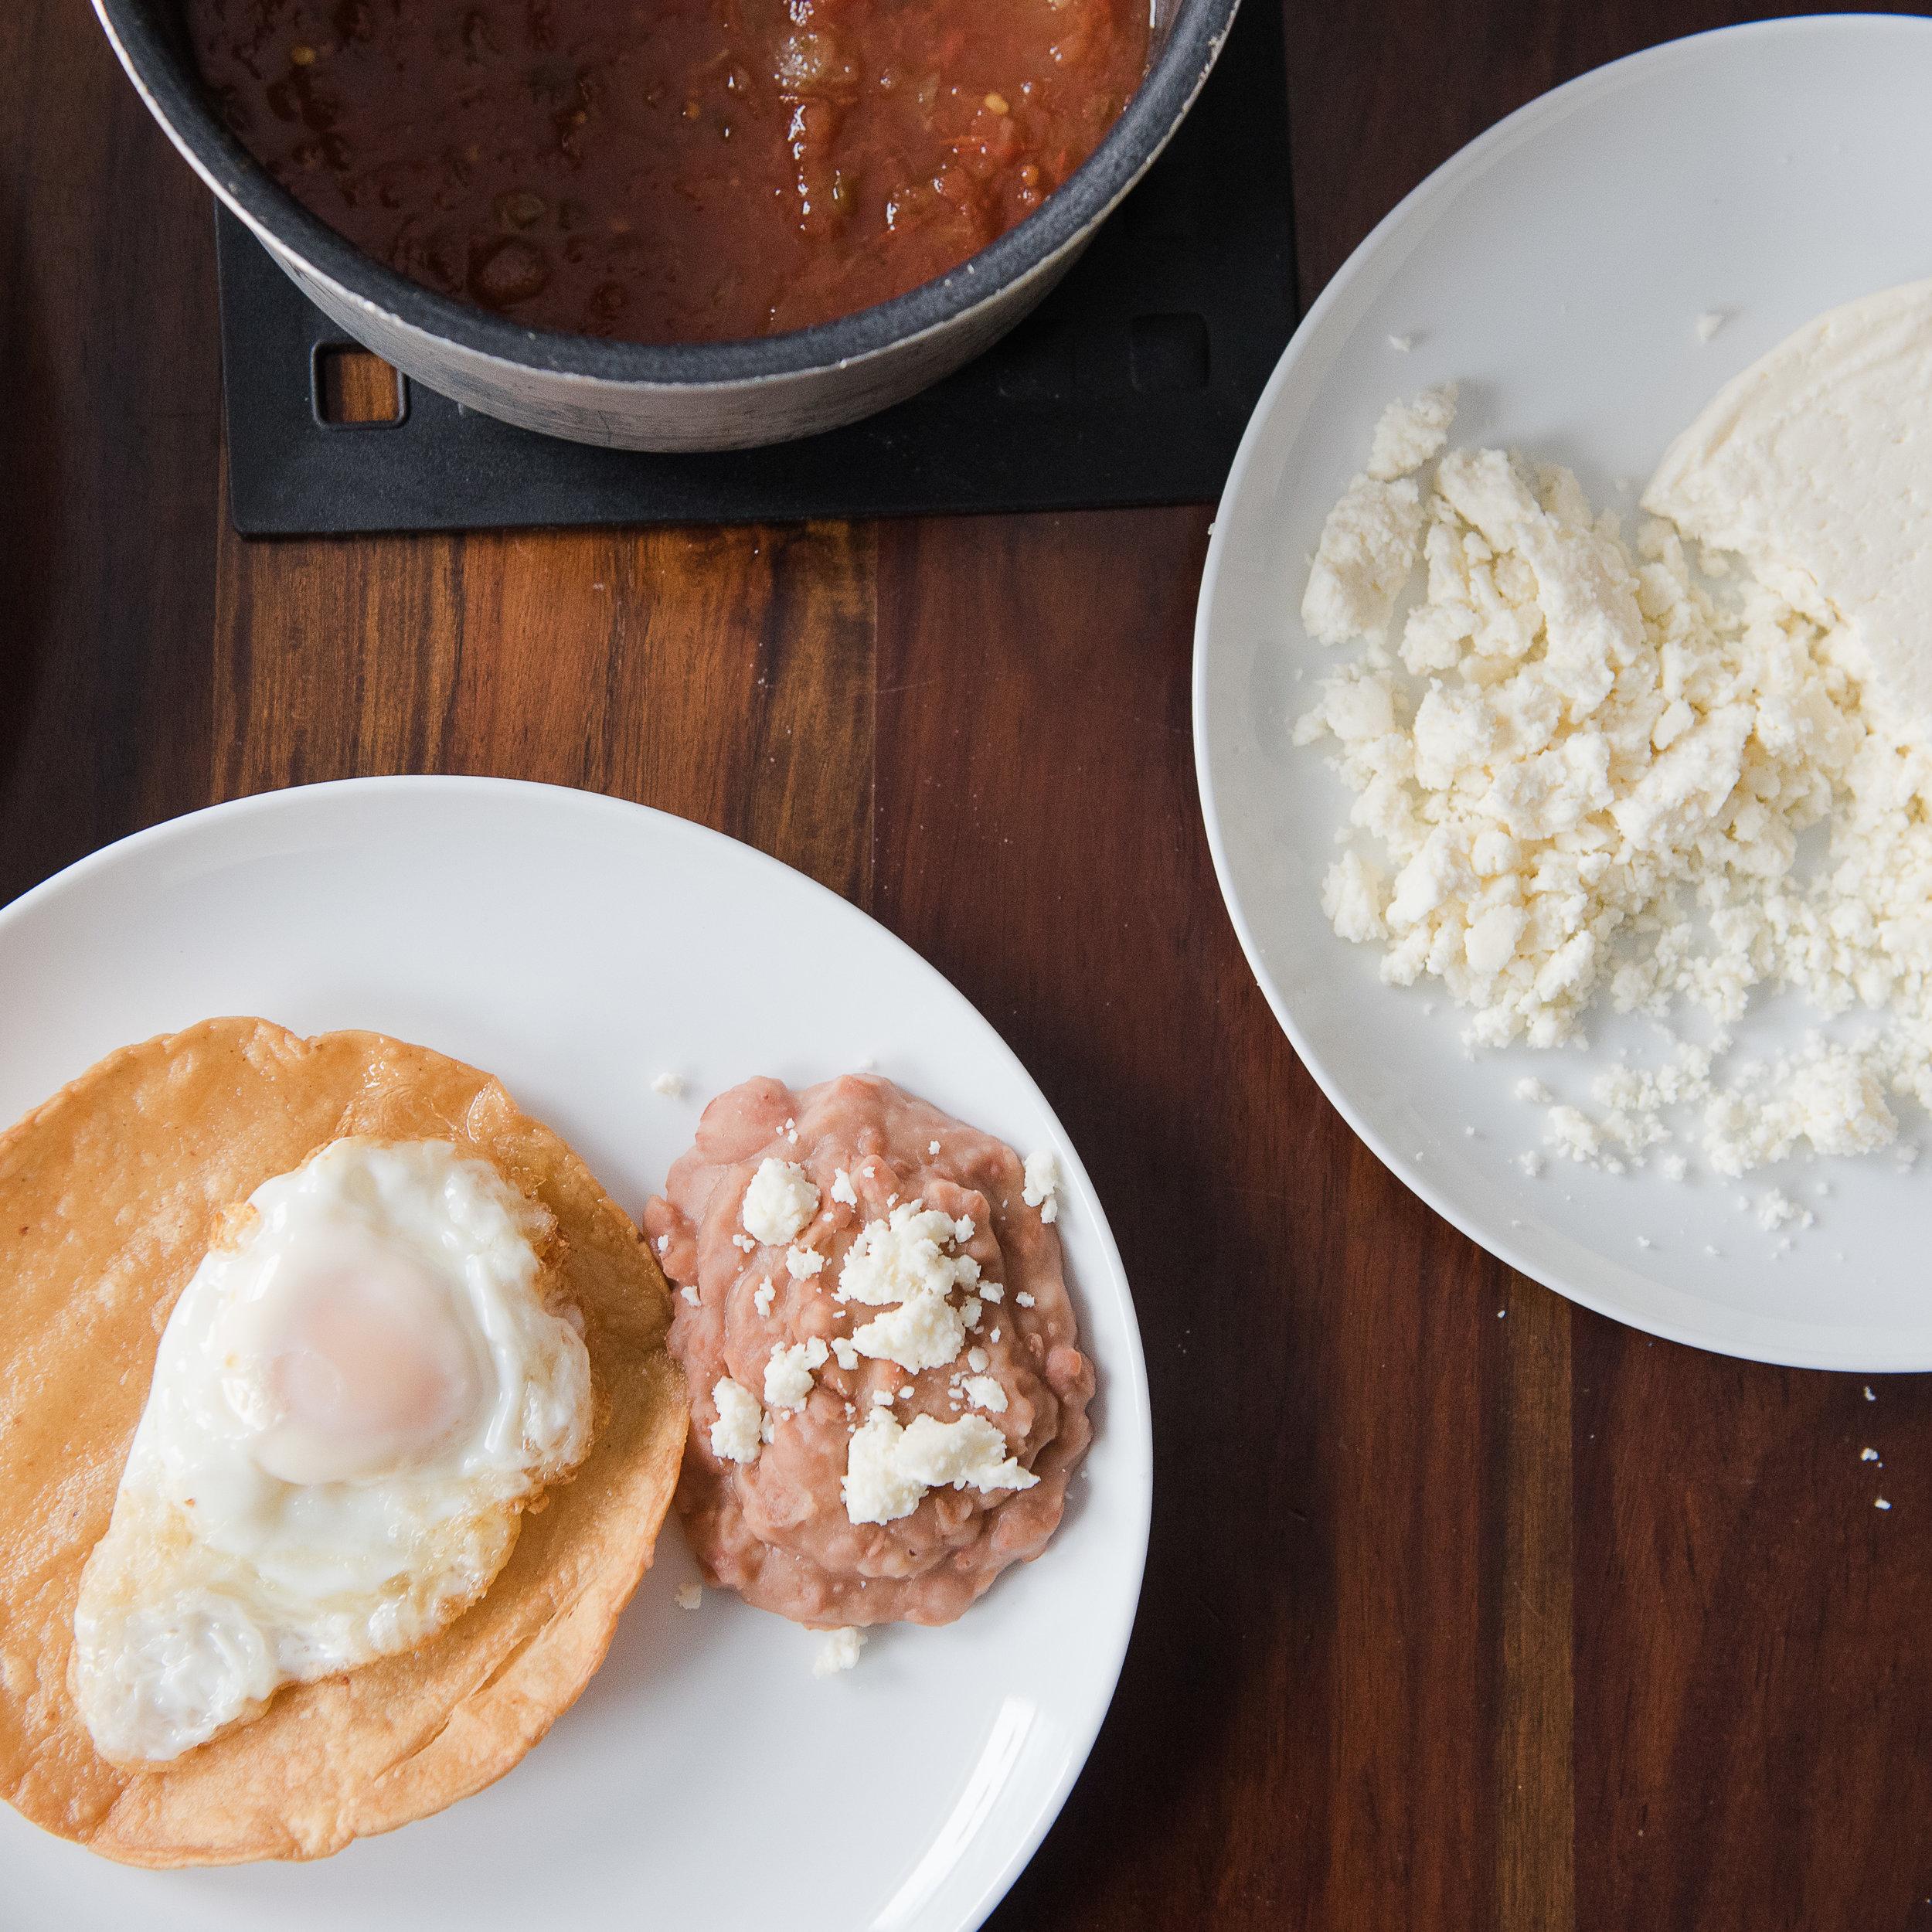 mexican-food-huevos-rancheros-breakfast-6.jpg